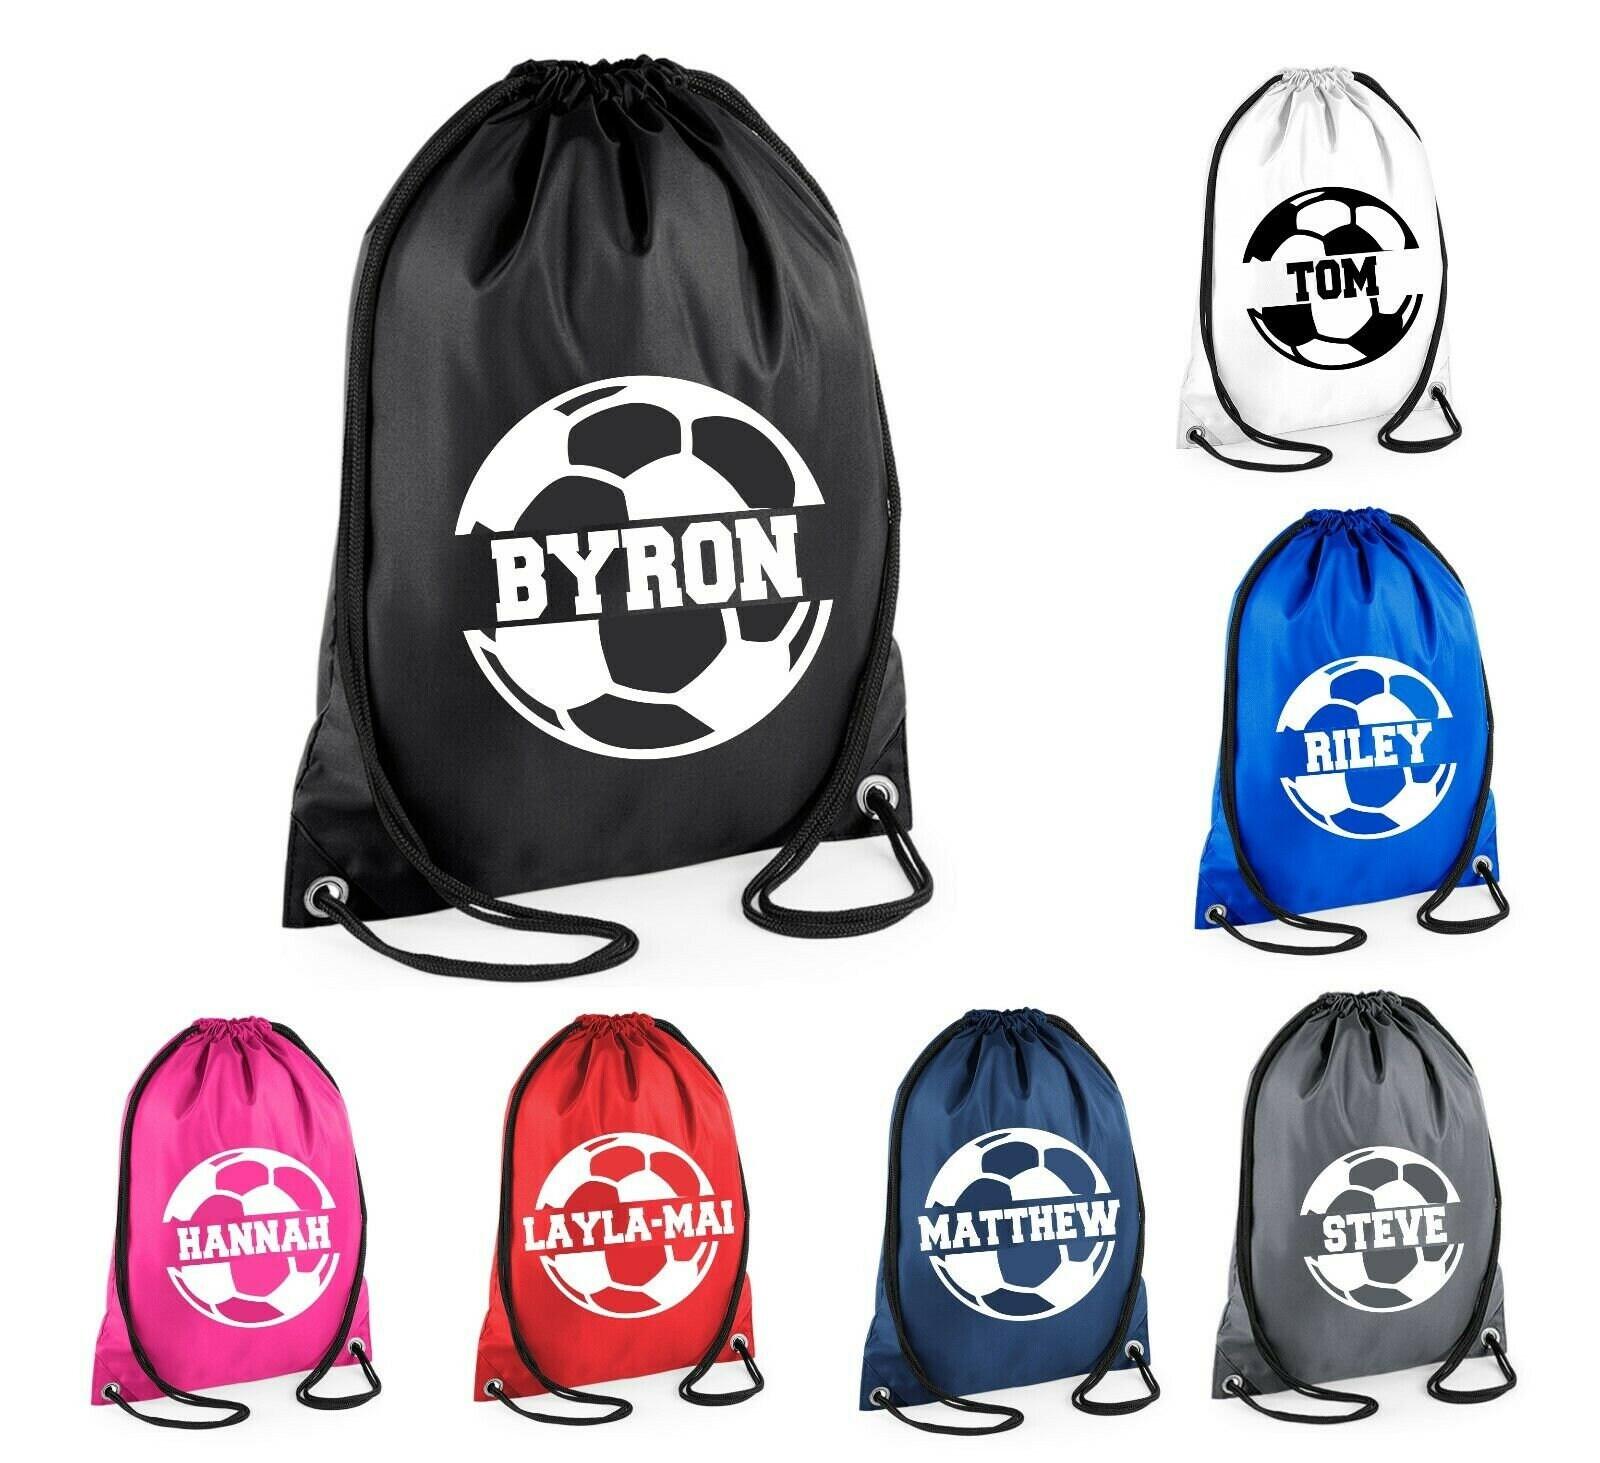 a8bde8ff5 Kids Personalised Name Drawstring Football Bag SPLIT Design | Etsy